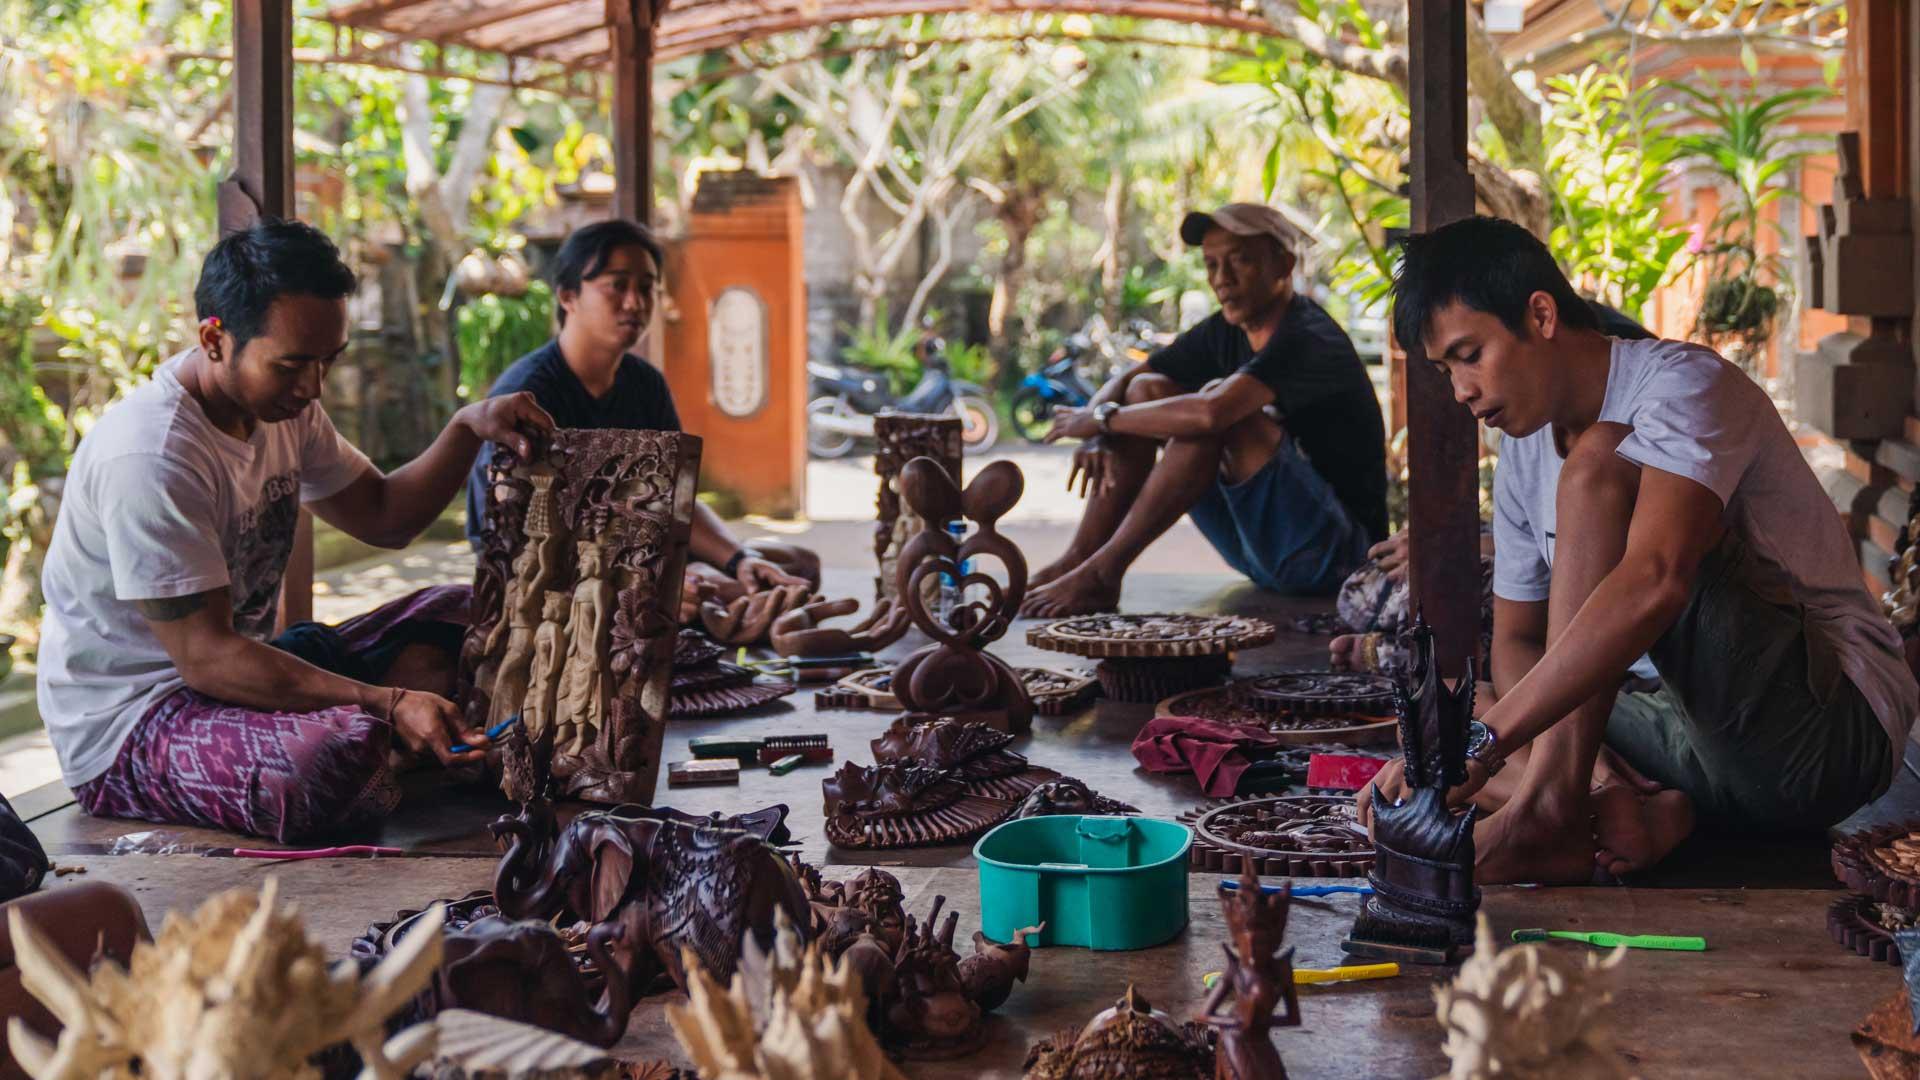 Balinese wood workers carving masks at the market - Bali